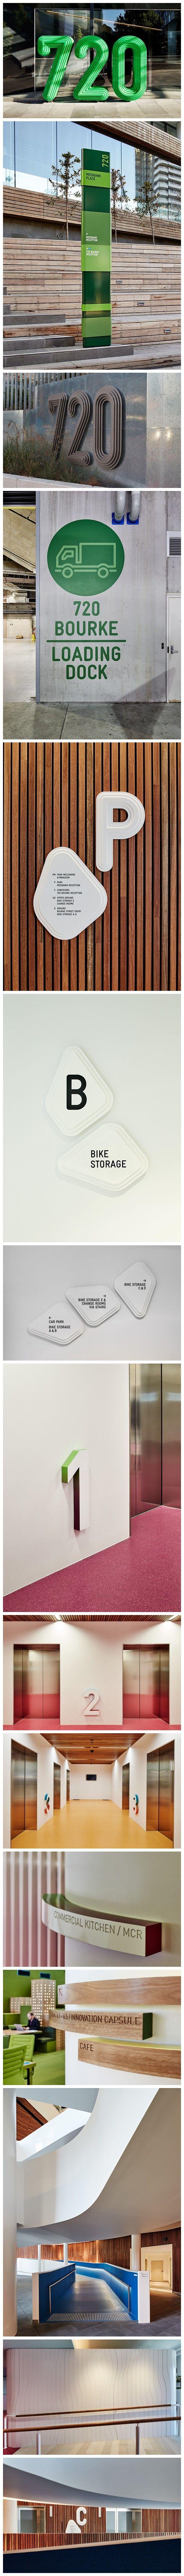 Medibank wayfaring signage and environmental graphics by Fabio Ongarato Design